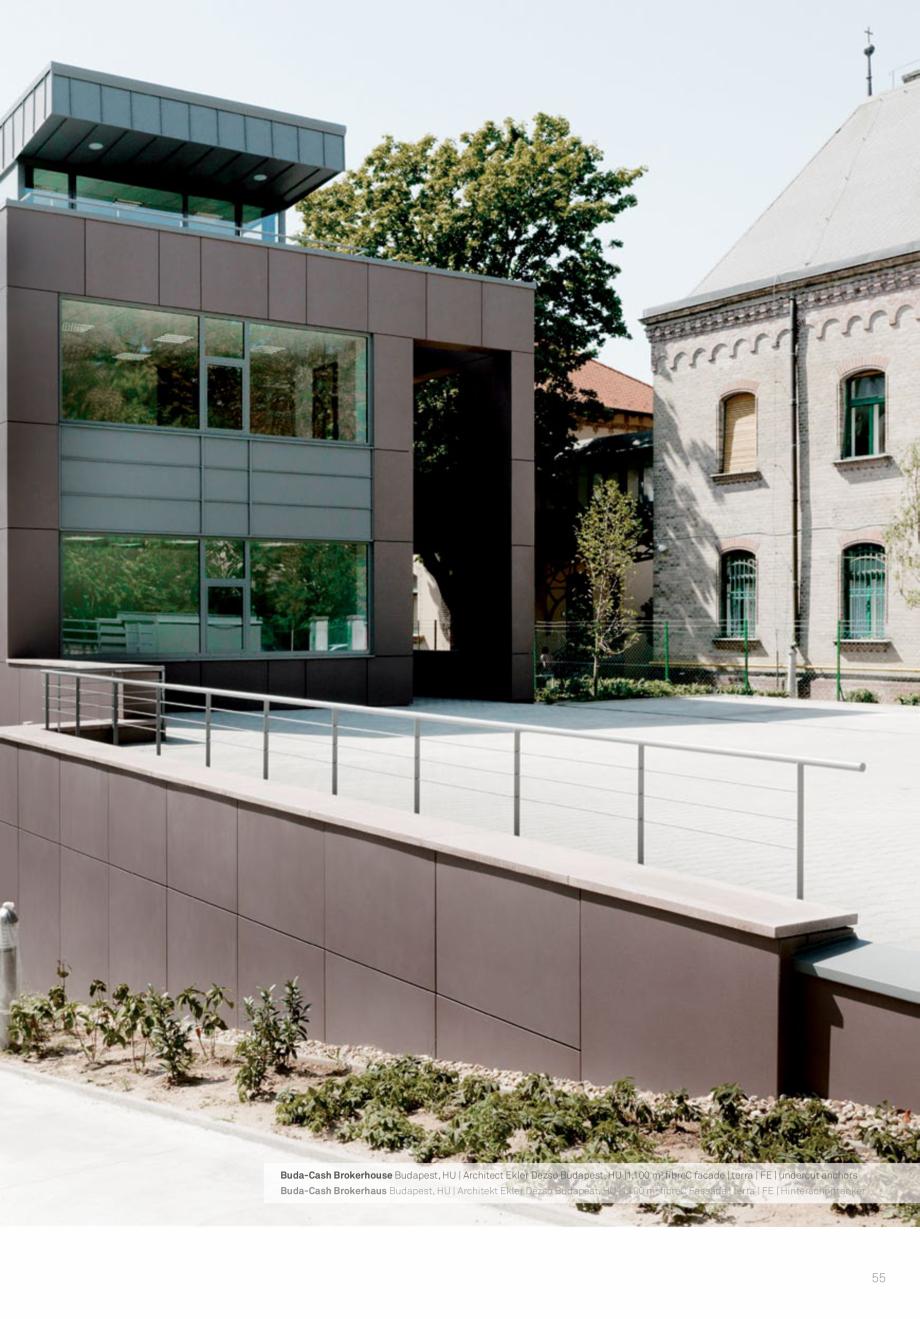 Pagina 57 - Panouri din beton aparent RIEDER Concrete Skin Lucrari, proiecte Engleza